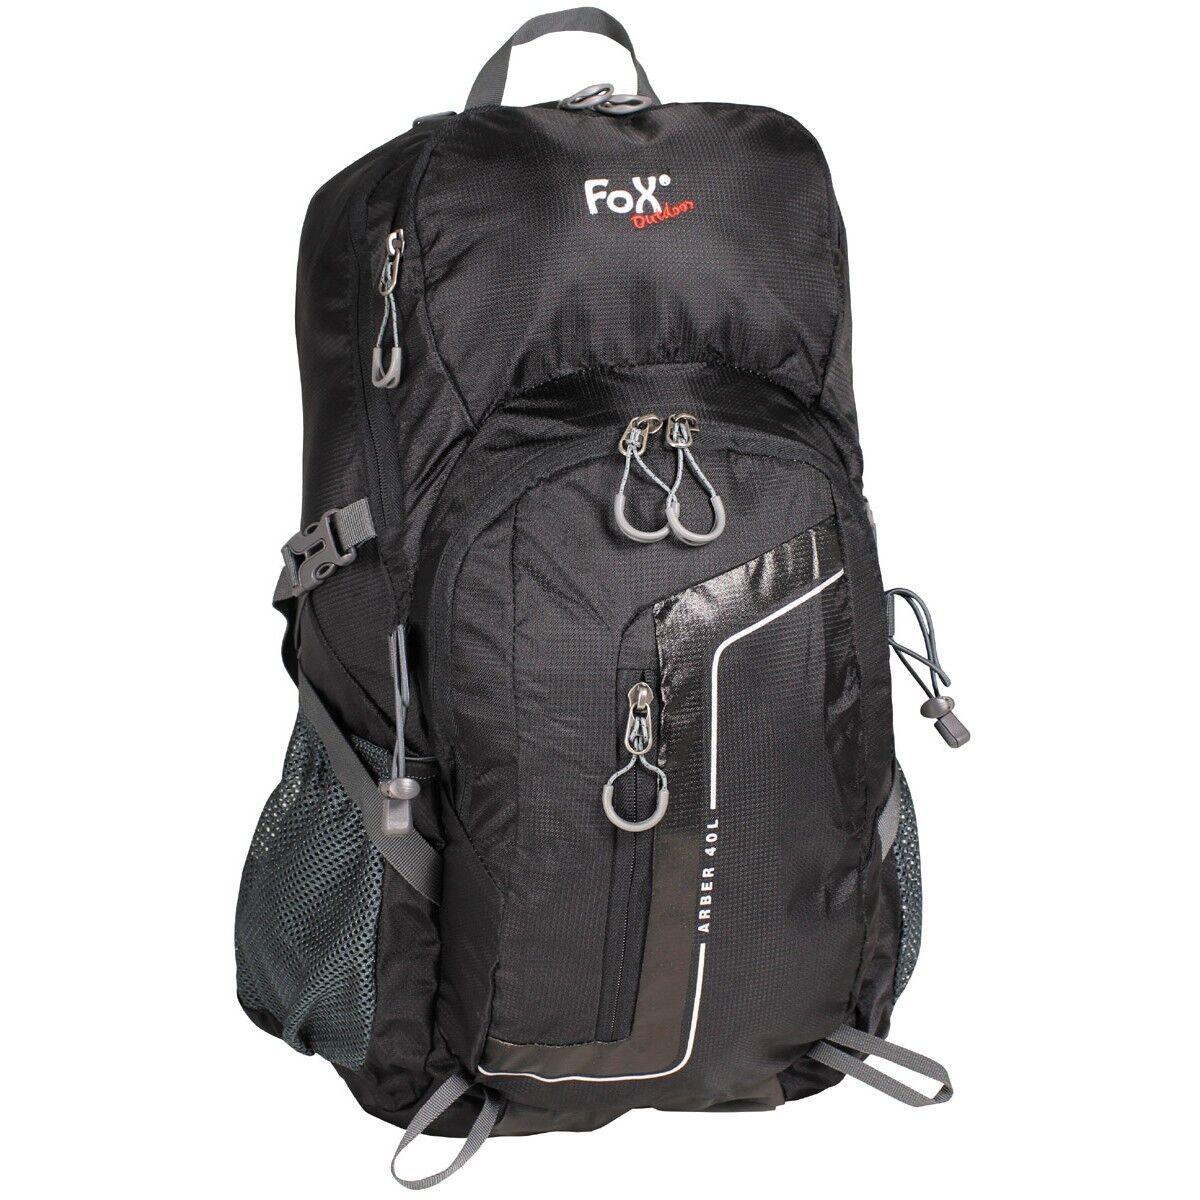 FOX Outdoor Zaino Borsa militare da Trekking leggero Backpack ARBER 40 30817A